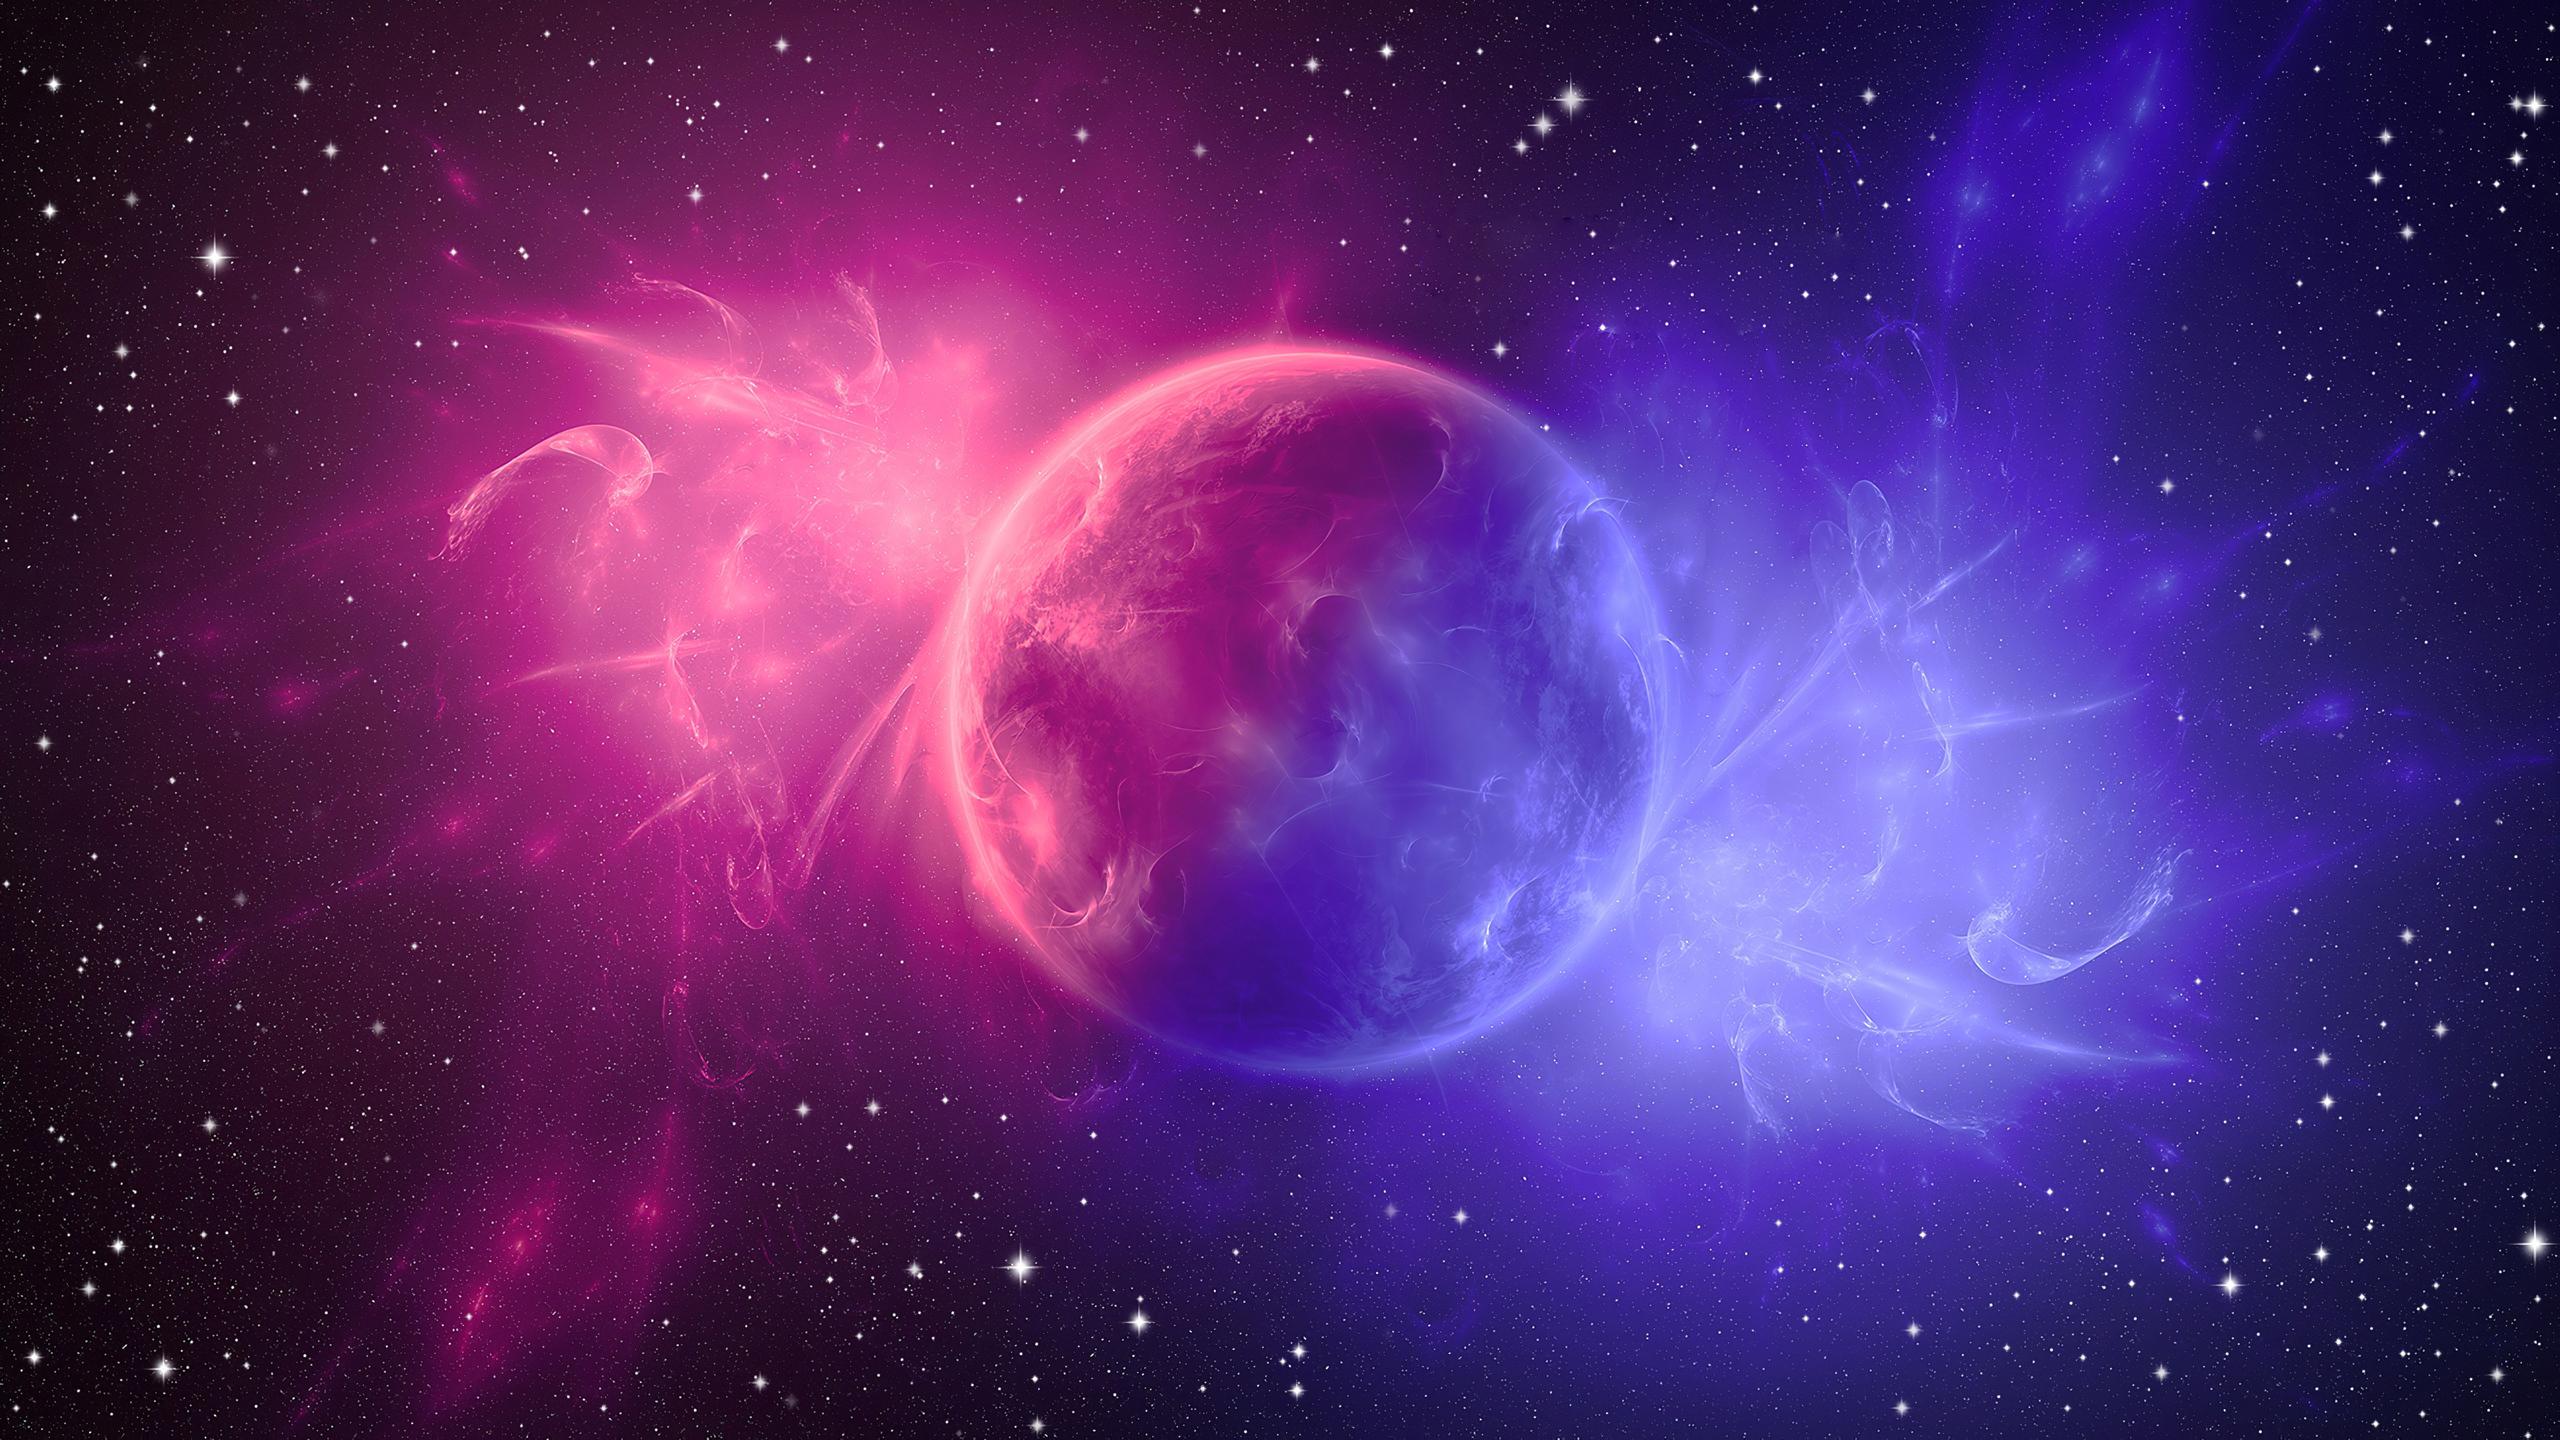 2560x1440 Space Digital Art Pink Planet 4k 1440P ...